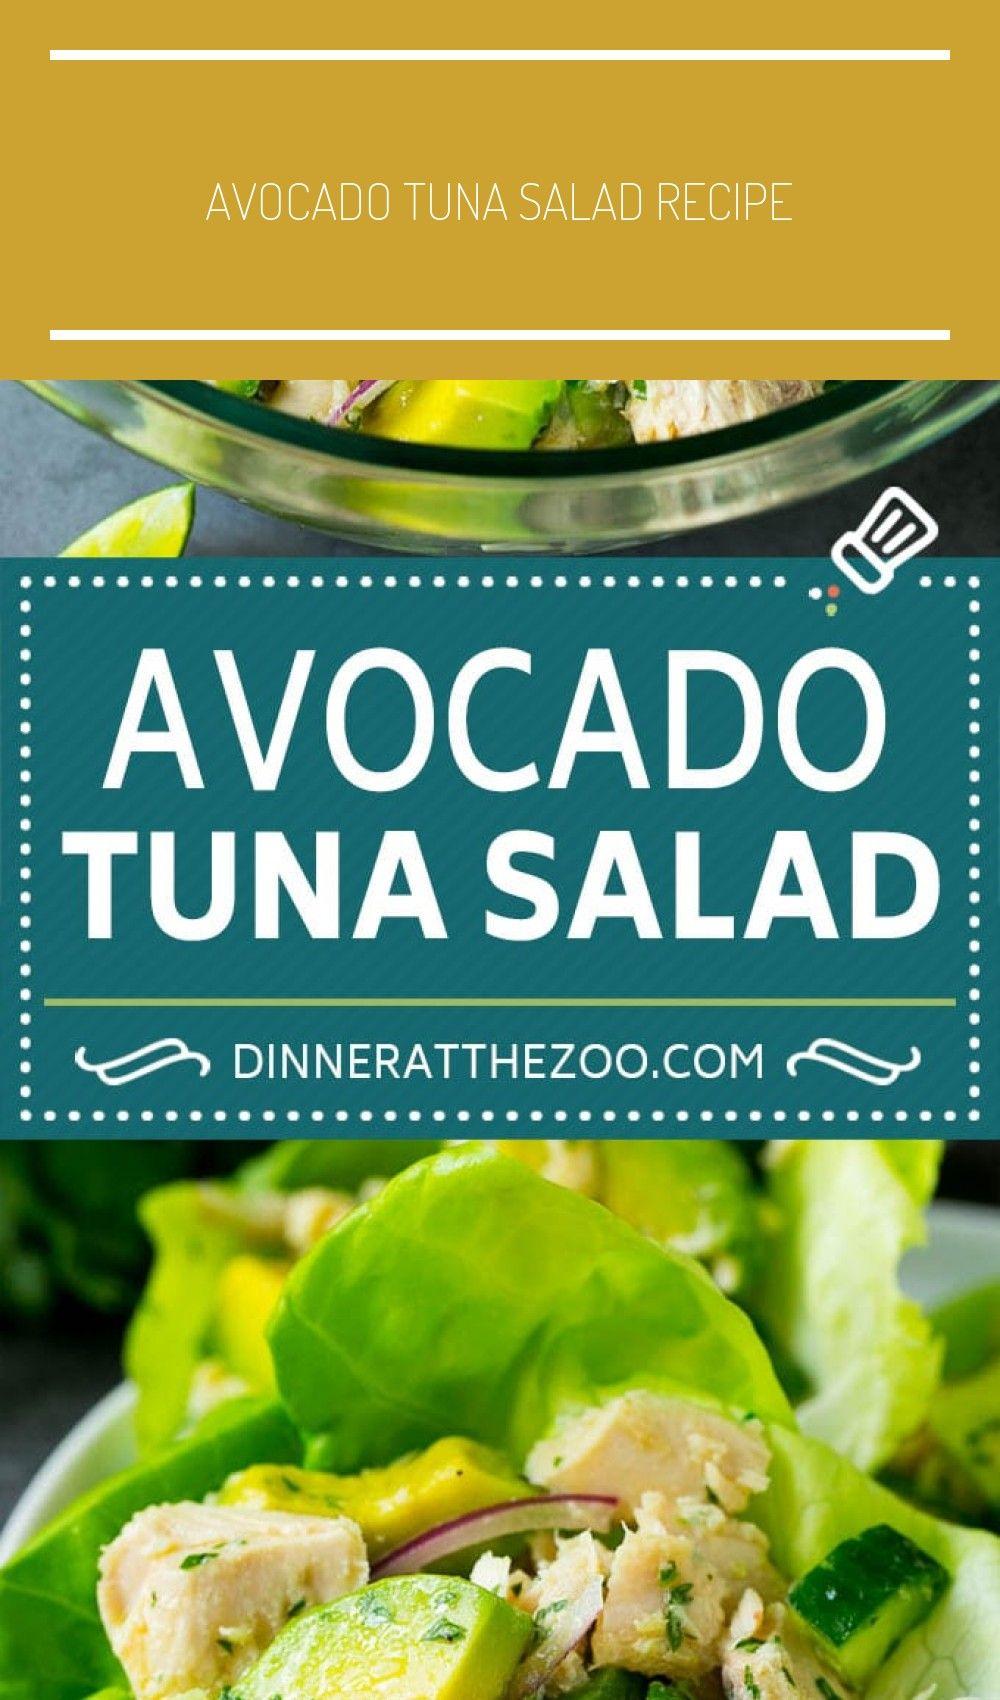 Avocado Tuna Salad Recipe | Avocado Salad  - Dinner at the Zoo Recipes - salad salmon